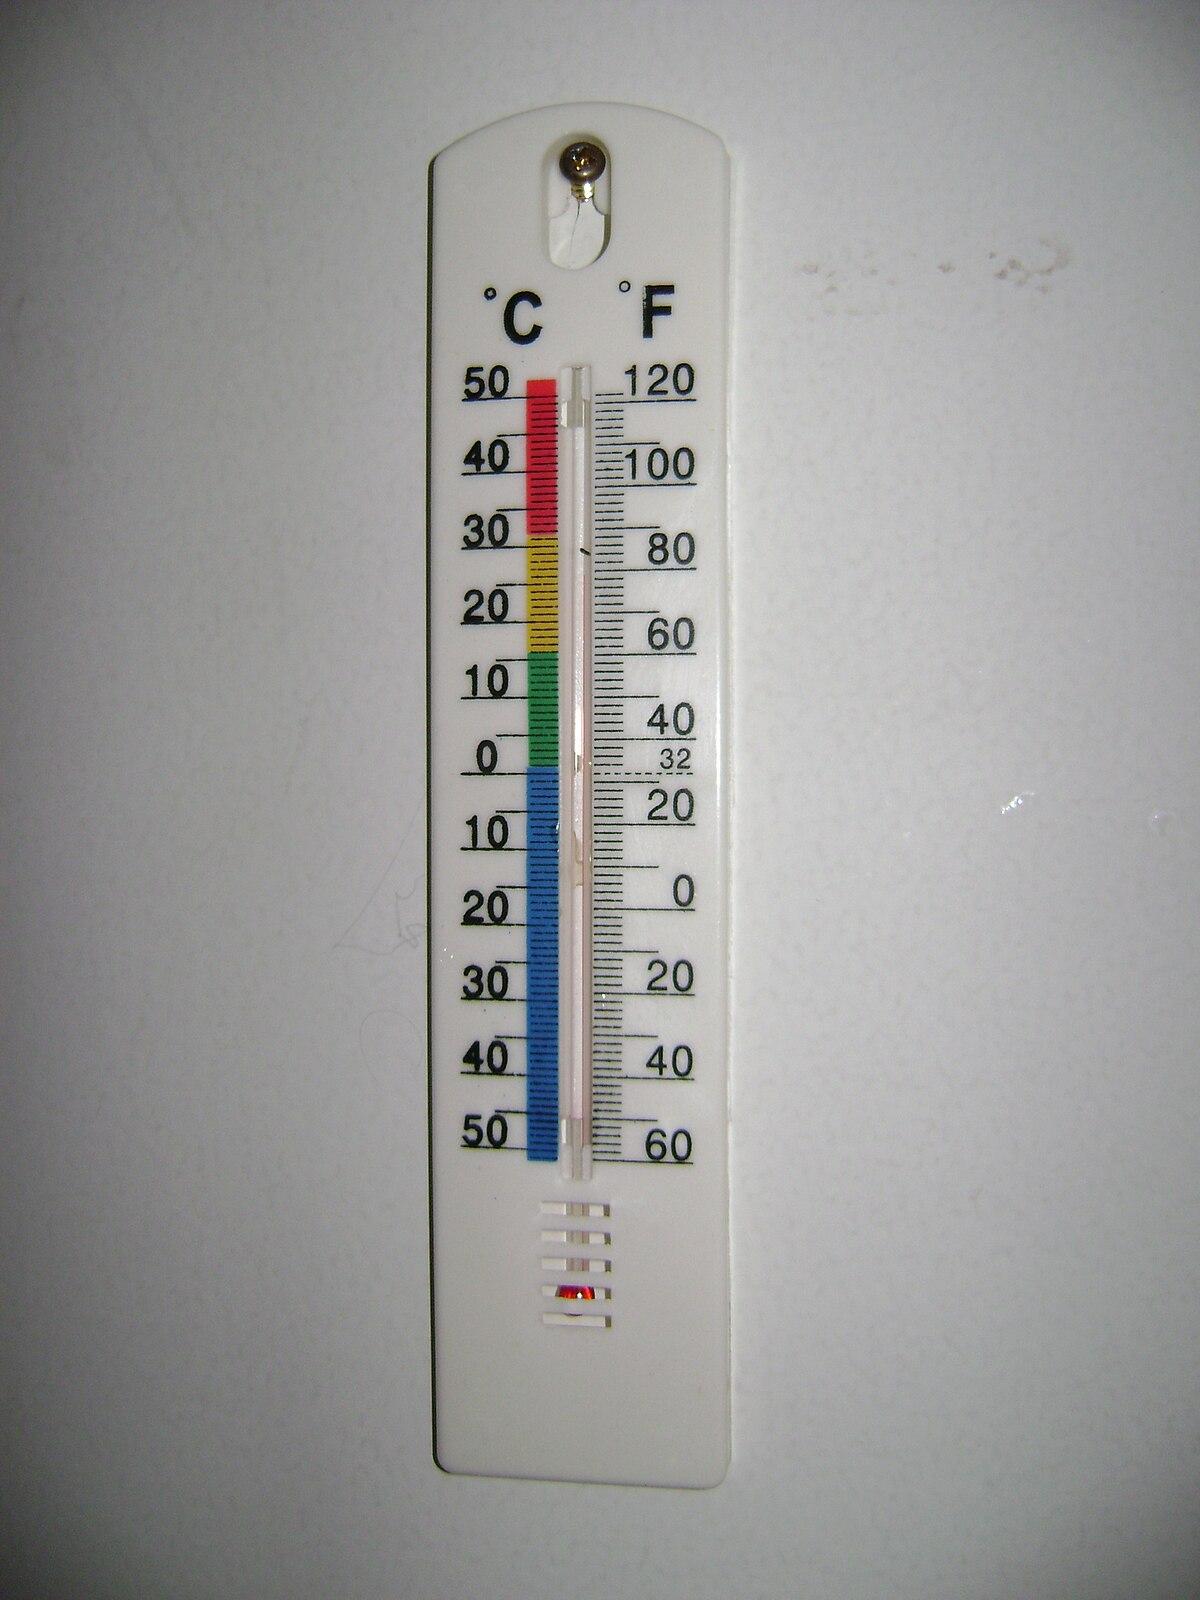 Term metro wikip dia a enciclop dia livre - Termometro de pared ...